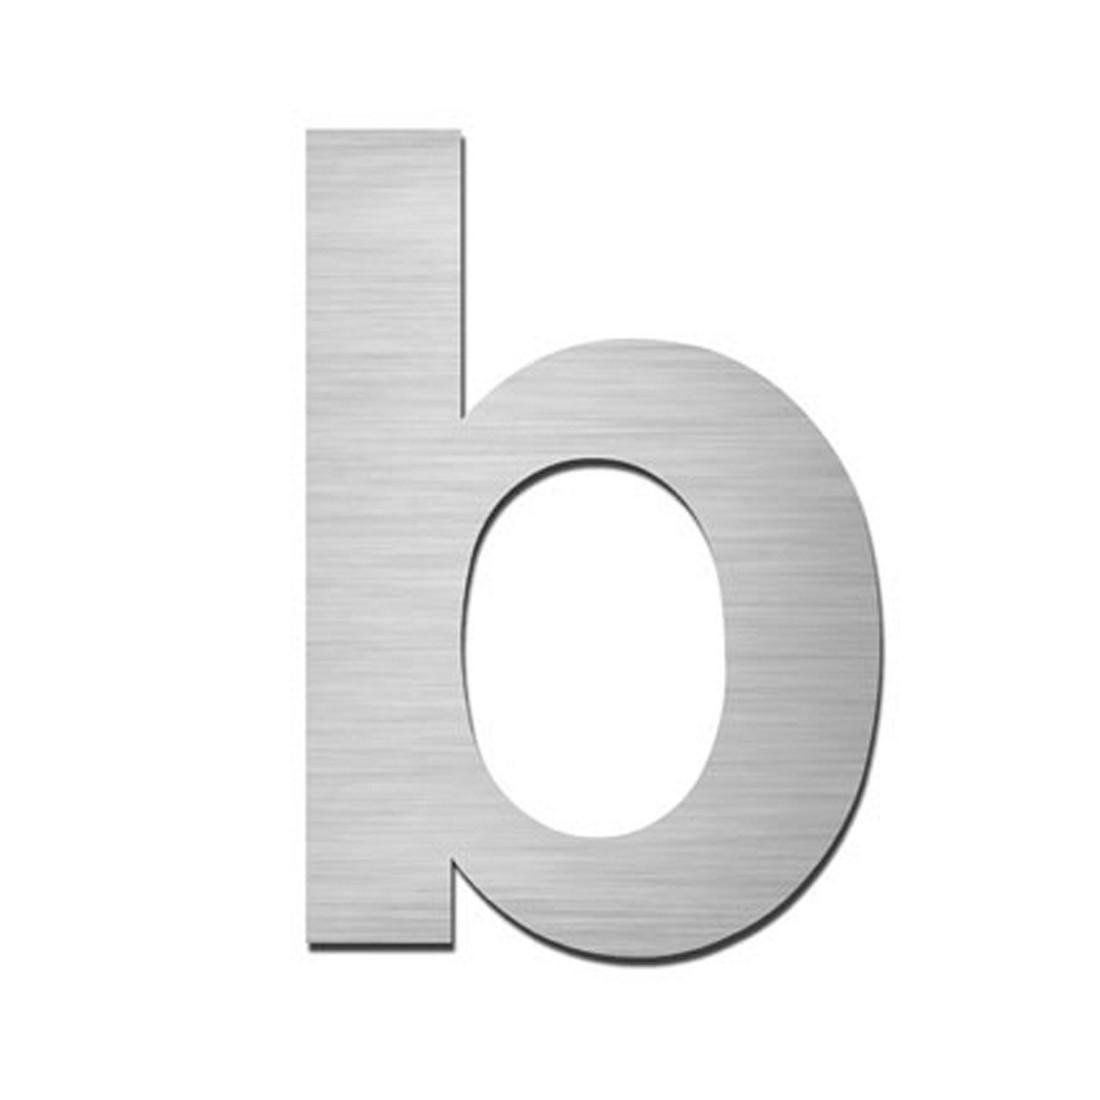 Hausnummer Index zum Aufkleben b - Matt Gebürstet Edelstahl Silber, Serafini